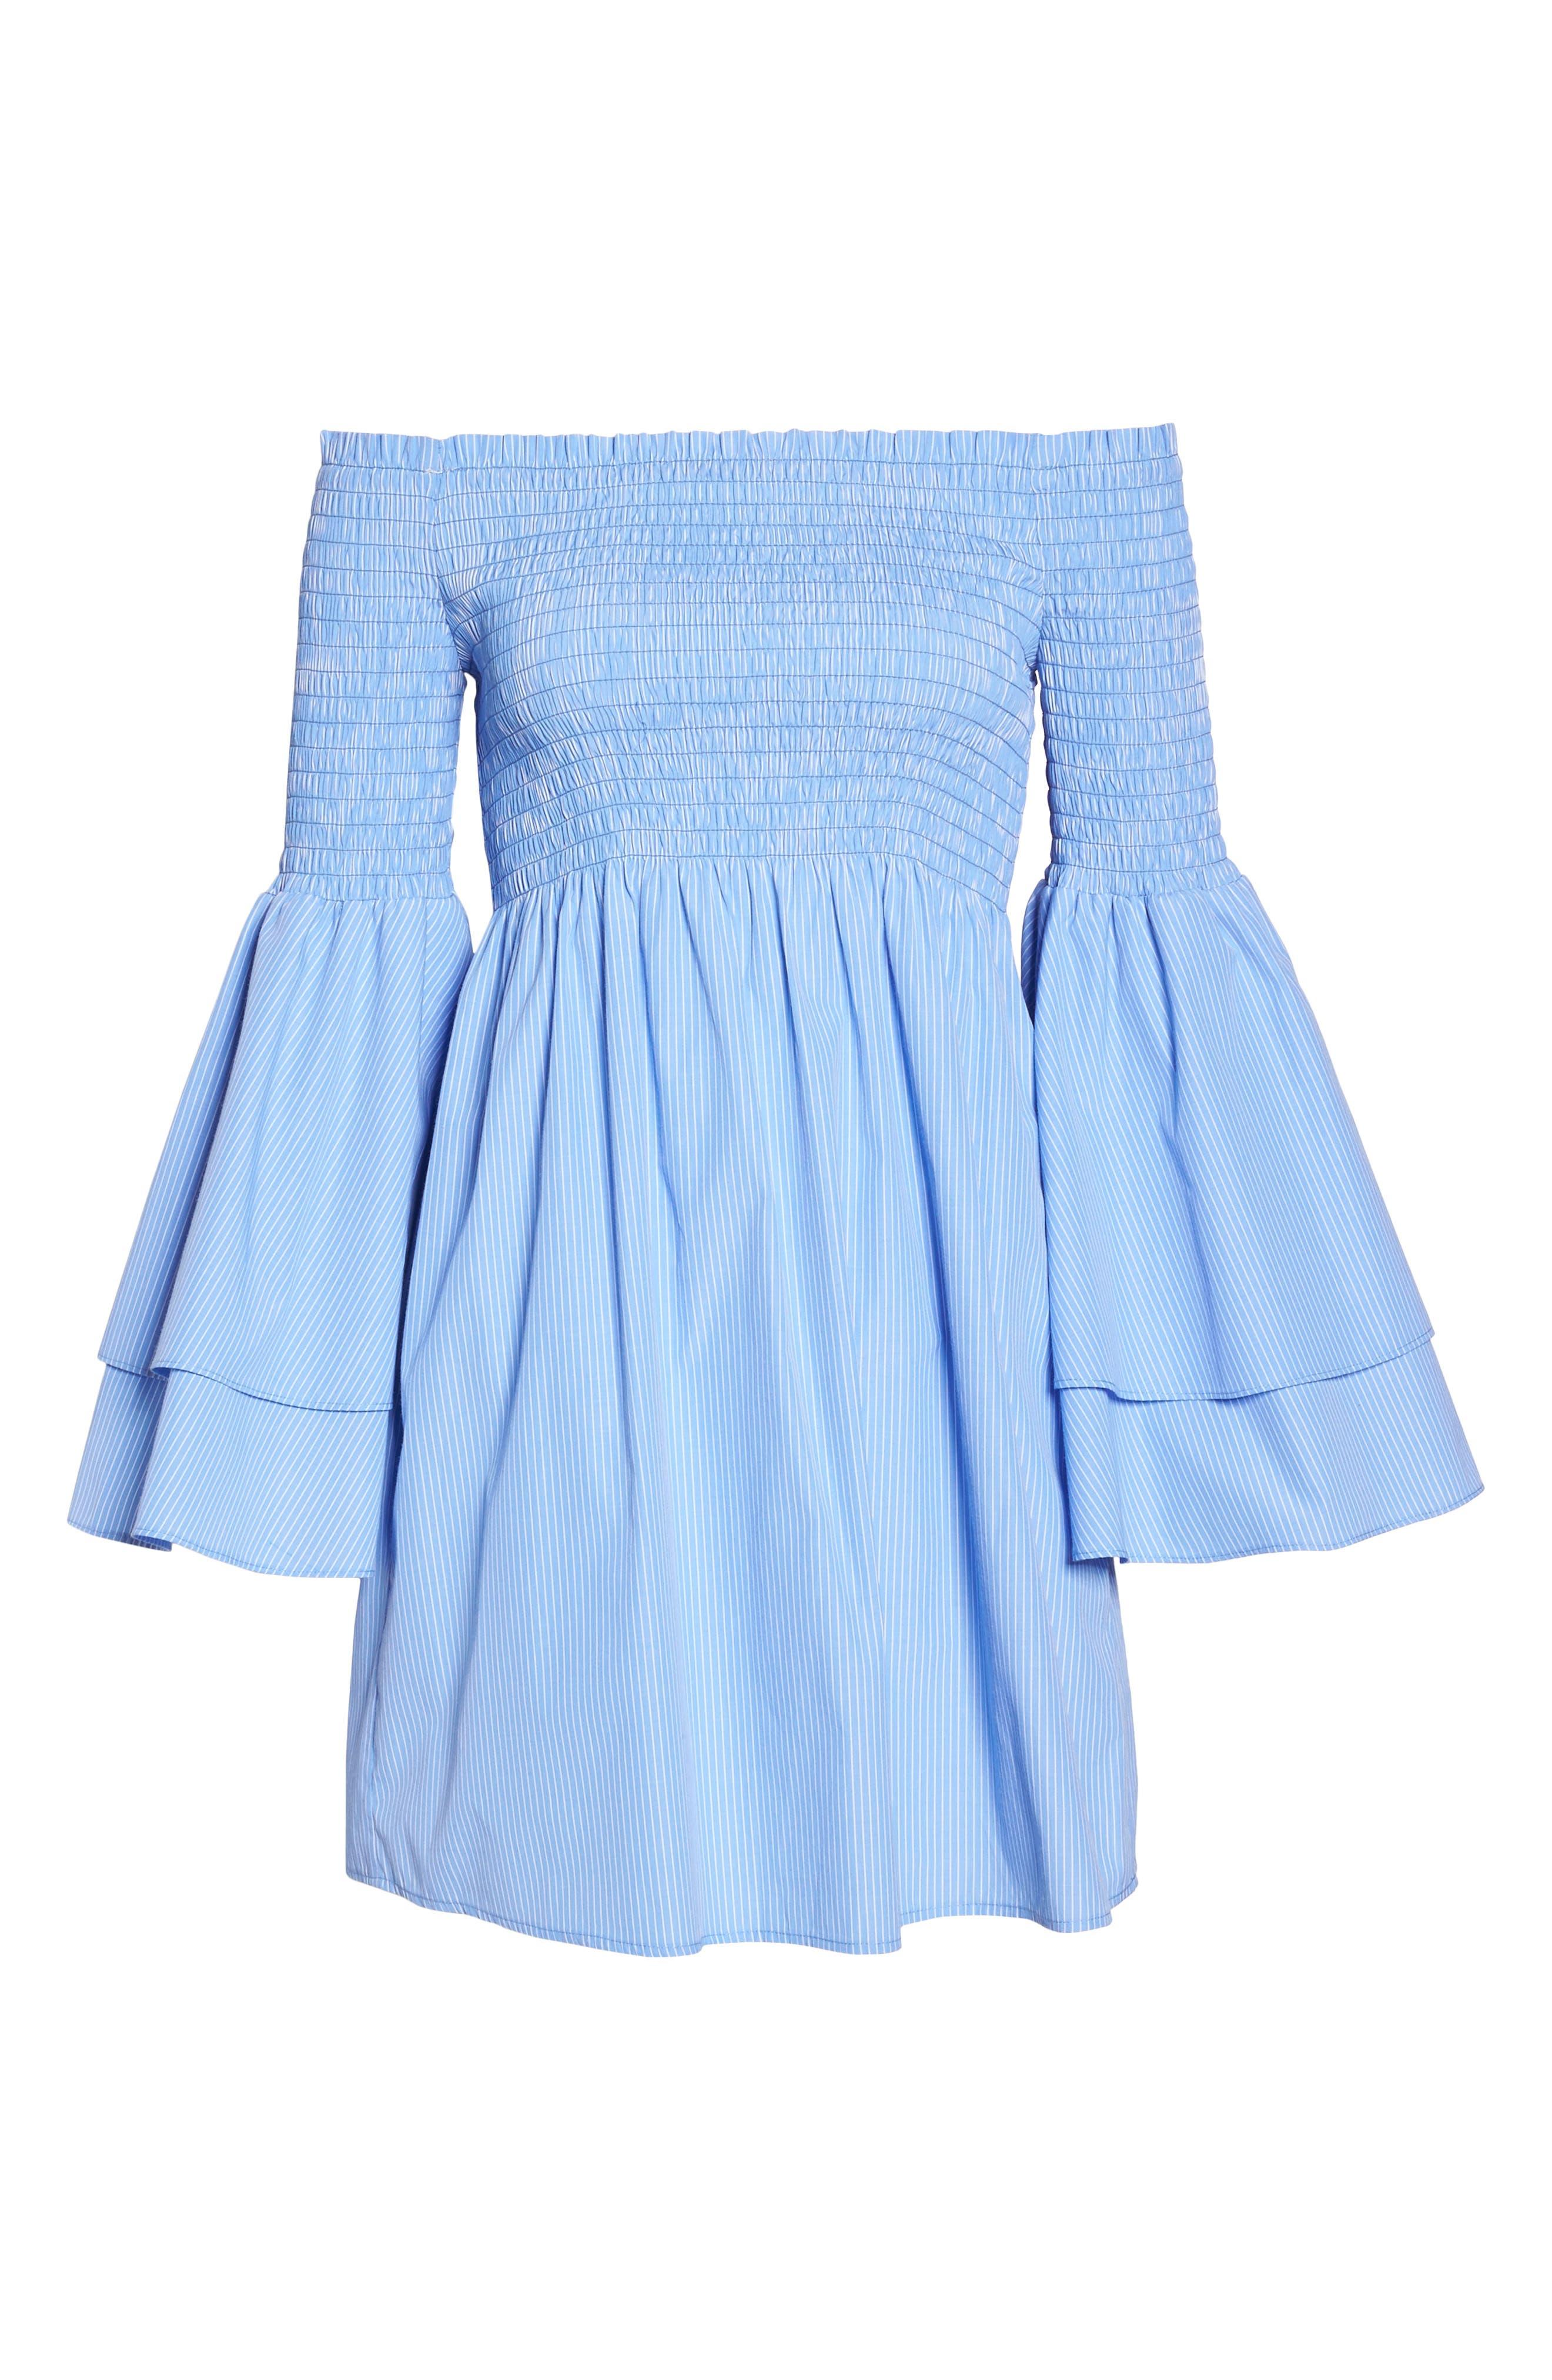 Smocked Off the Shoulder Bell Sleeve Dress,                             Alternate thumbnail 6, color,                             Blue/ White Stripe